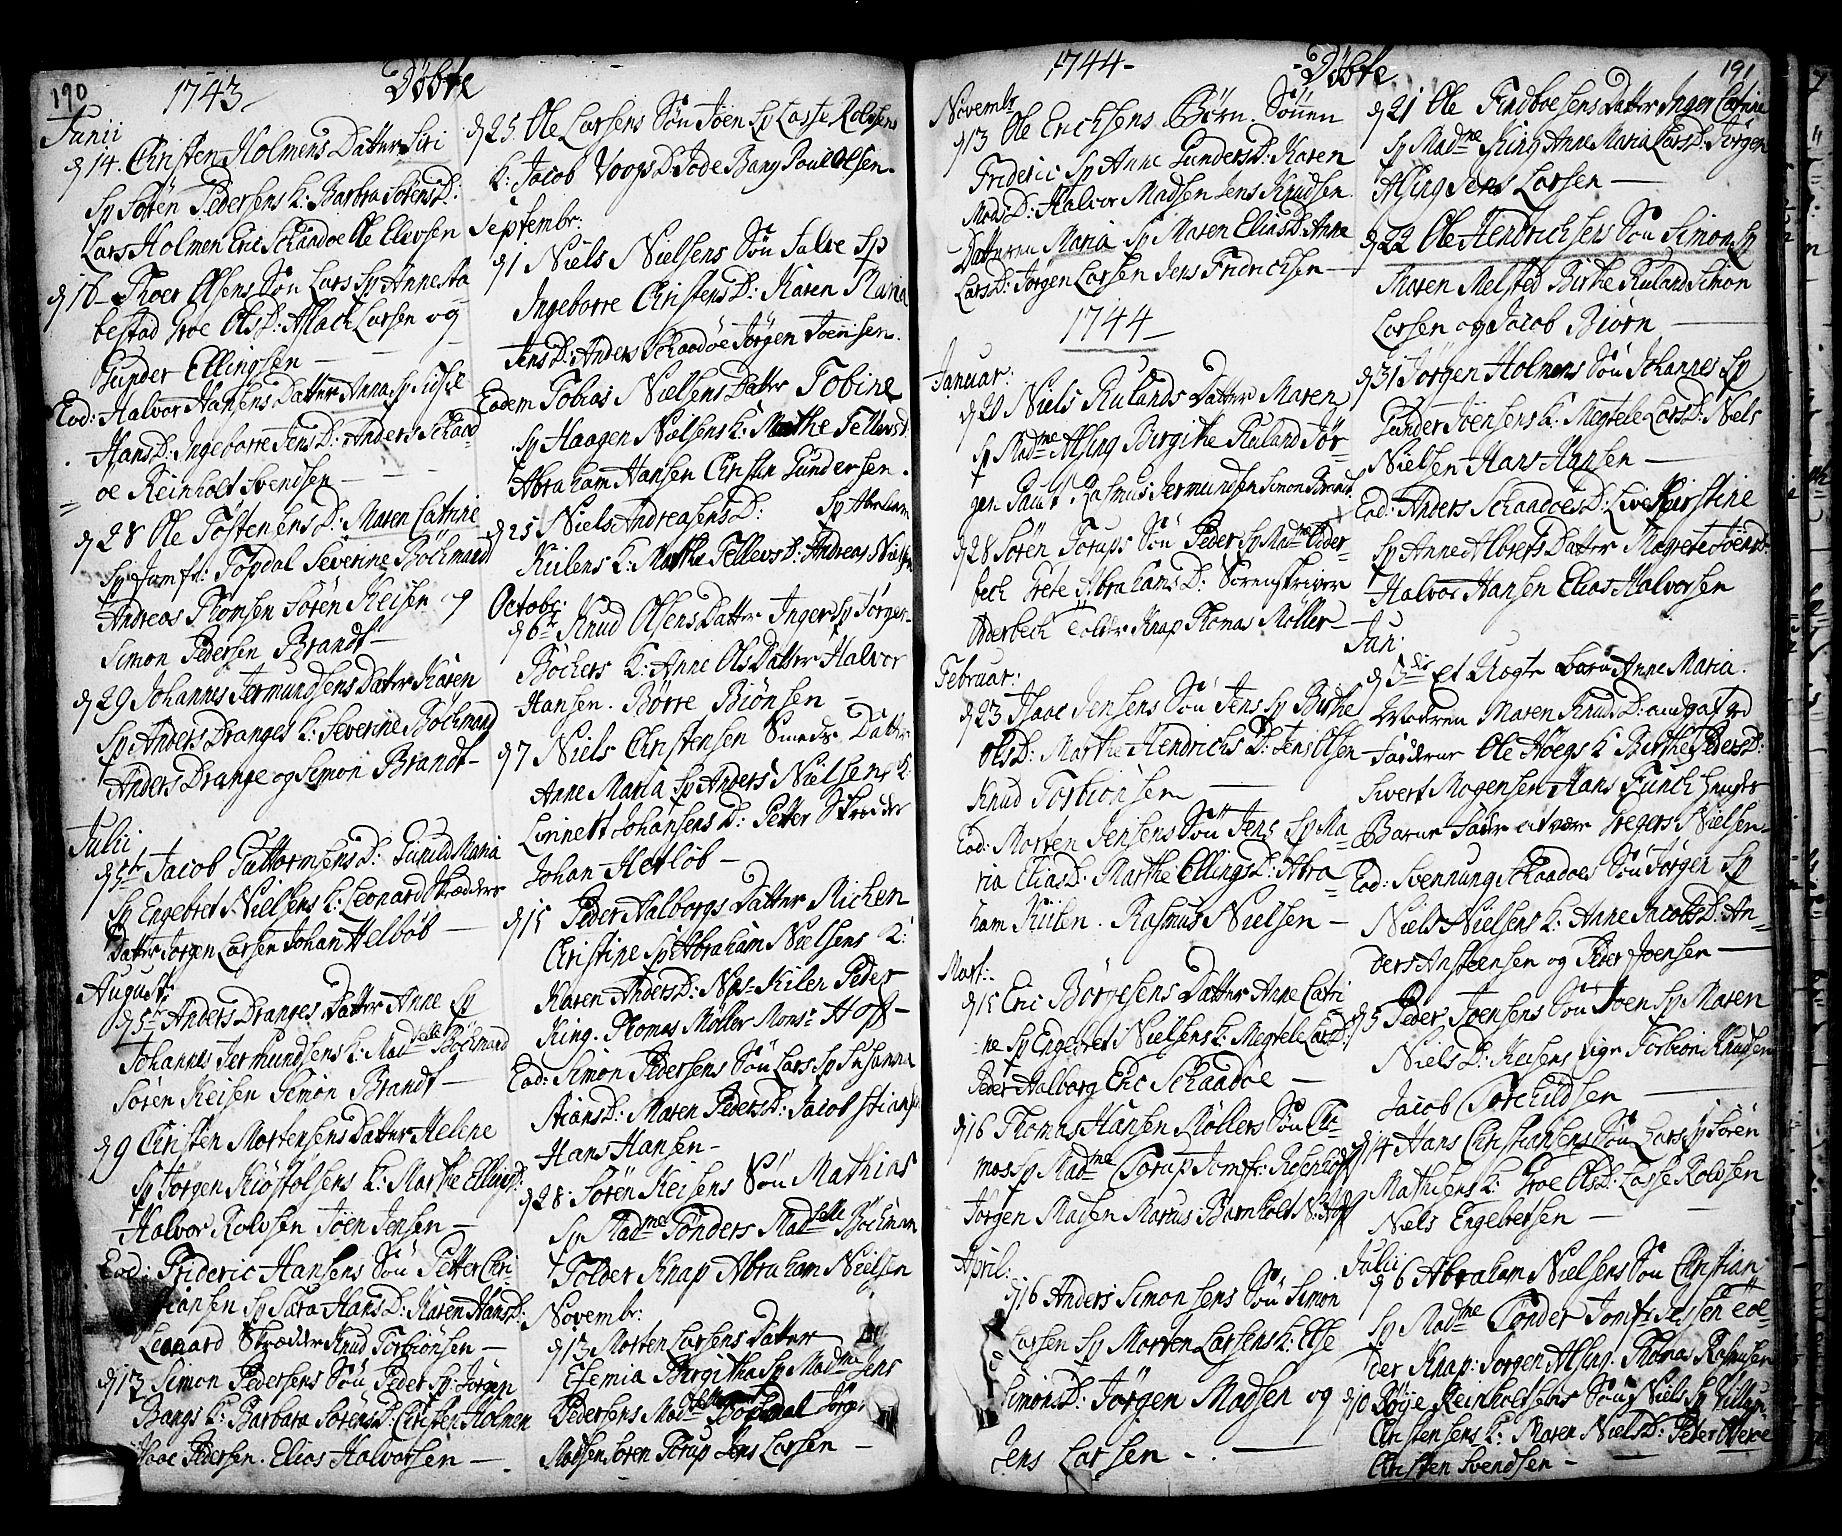 SAKO, Kragerø kirkebøker, F/Fa/L0001: Ministerialbok nr. 1, 1702-1766, s. 190-191